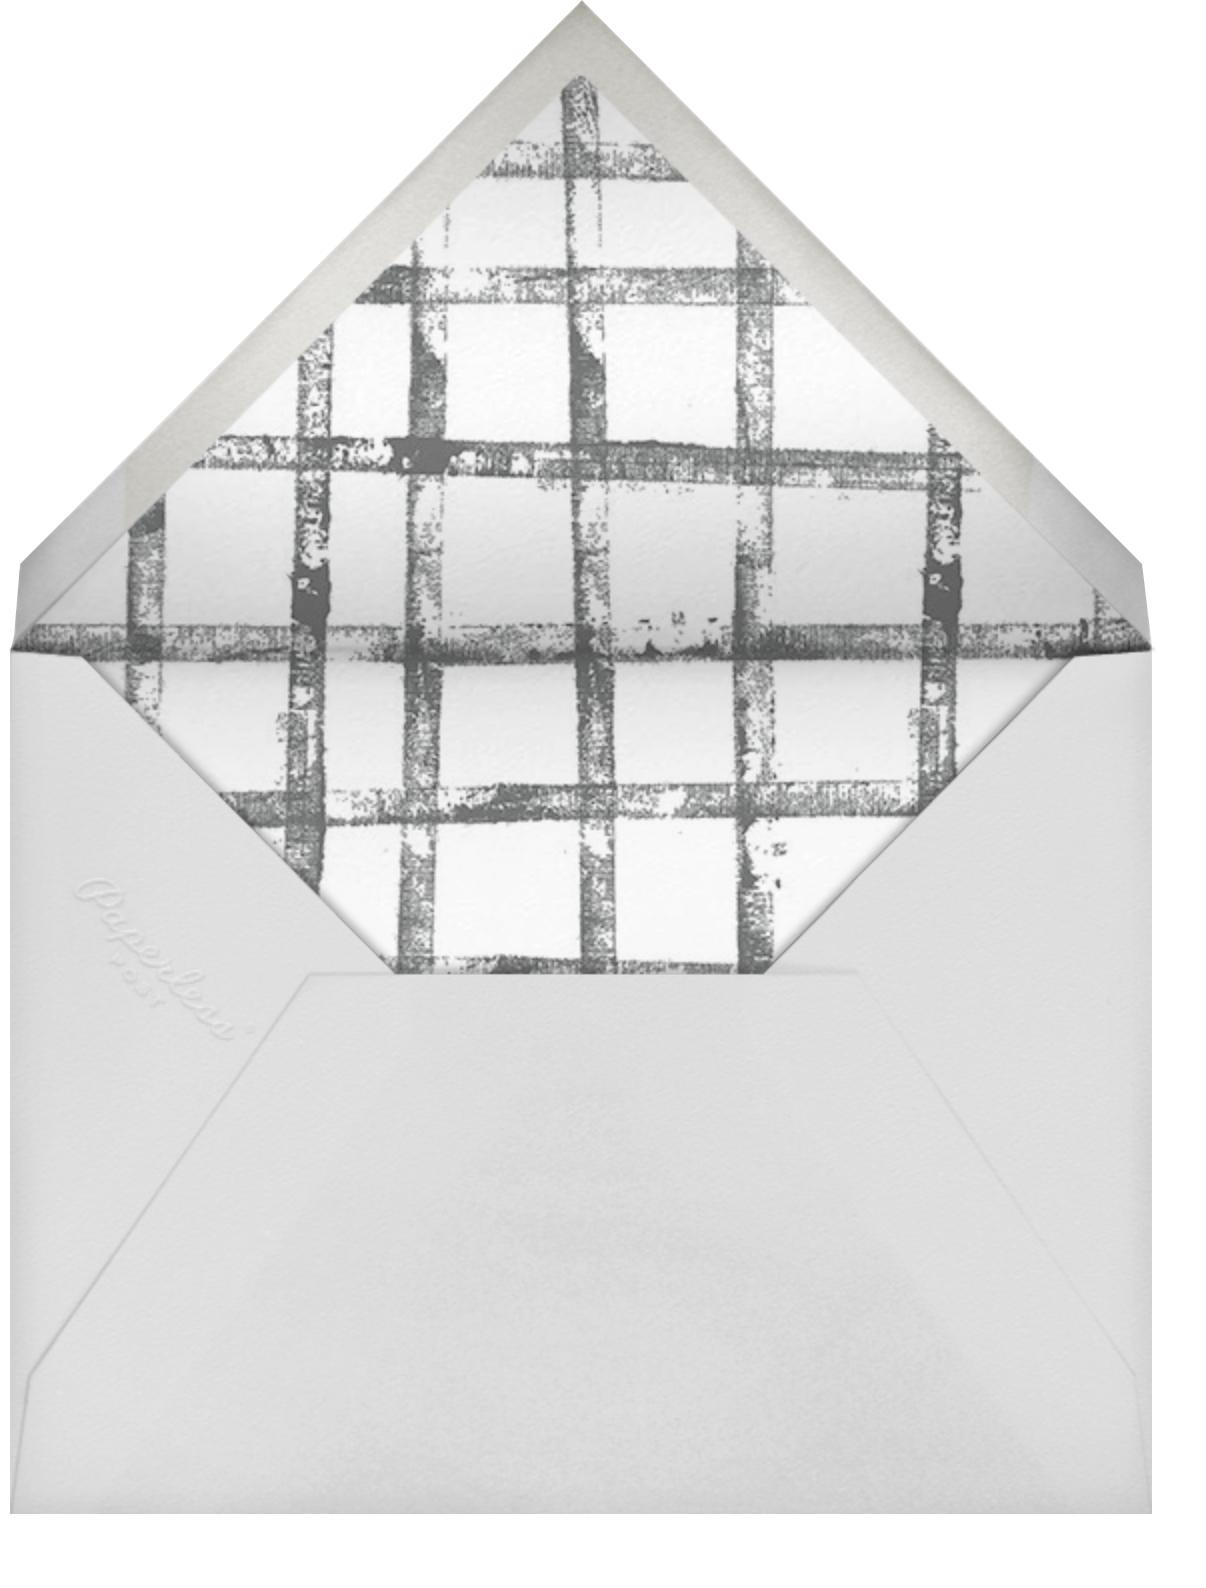 Alchemy (Invitation) - Kelly Wearstler - All - envelope back